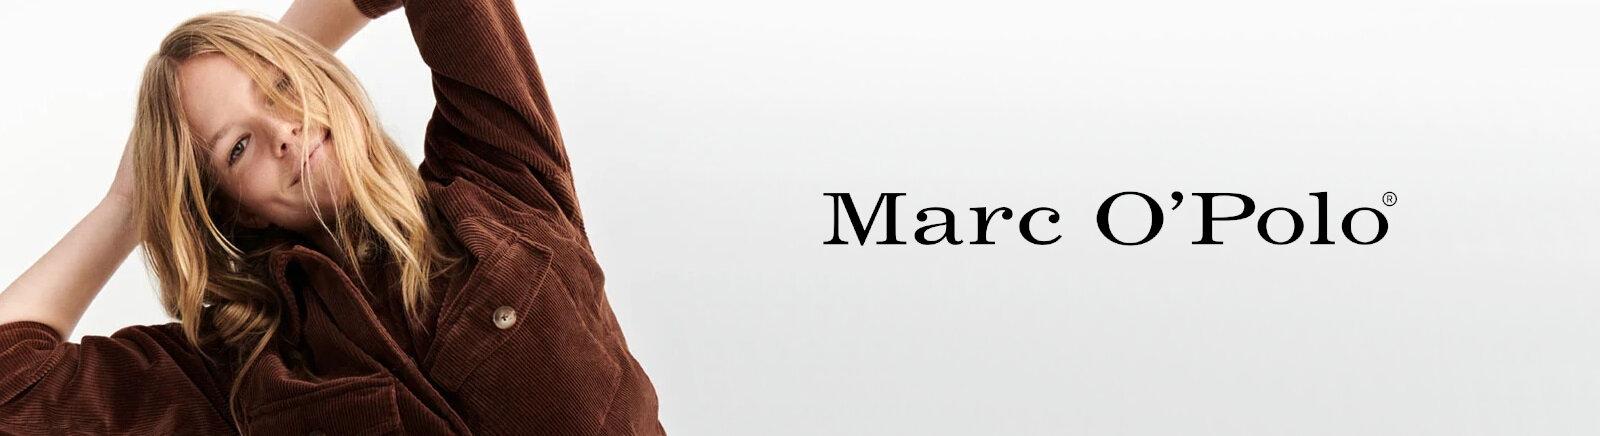 Juppen: Marc O'Polo Schnürschuhe für Damen online shoppen